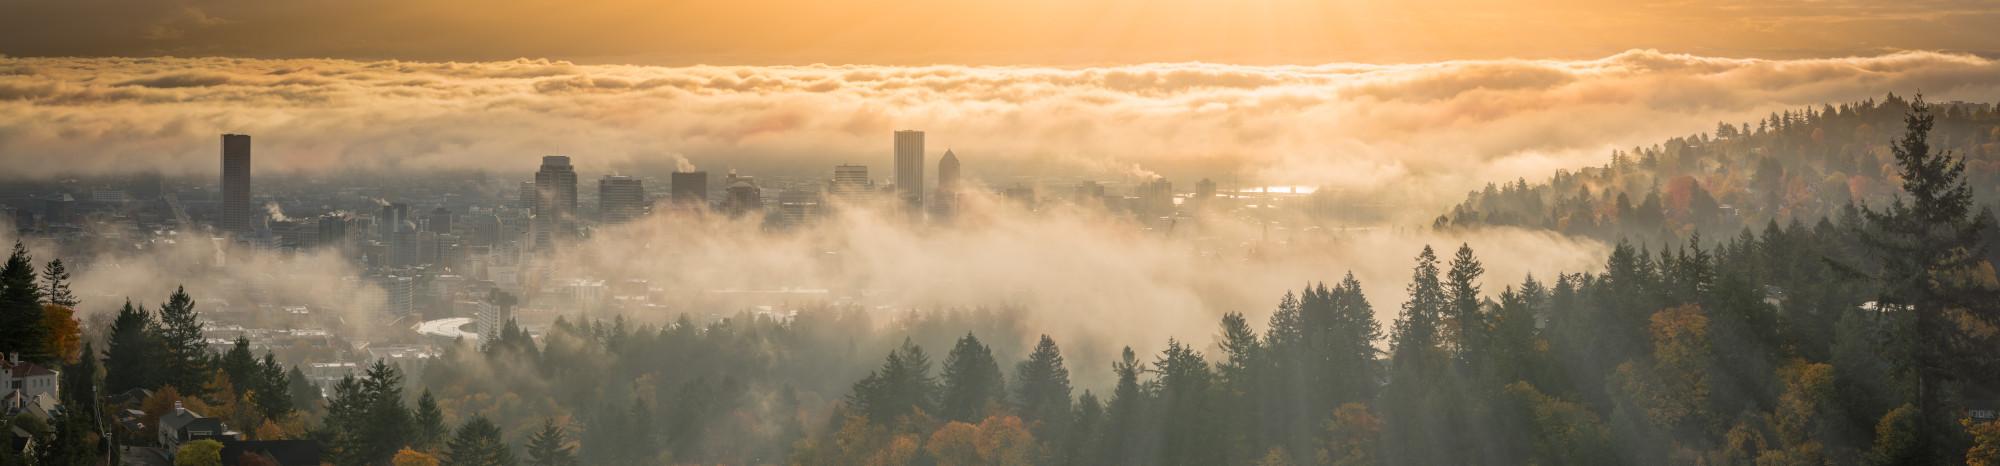 Portland Oregon Foggy Landscape